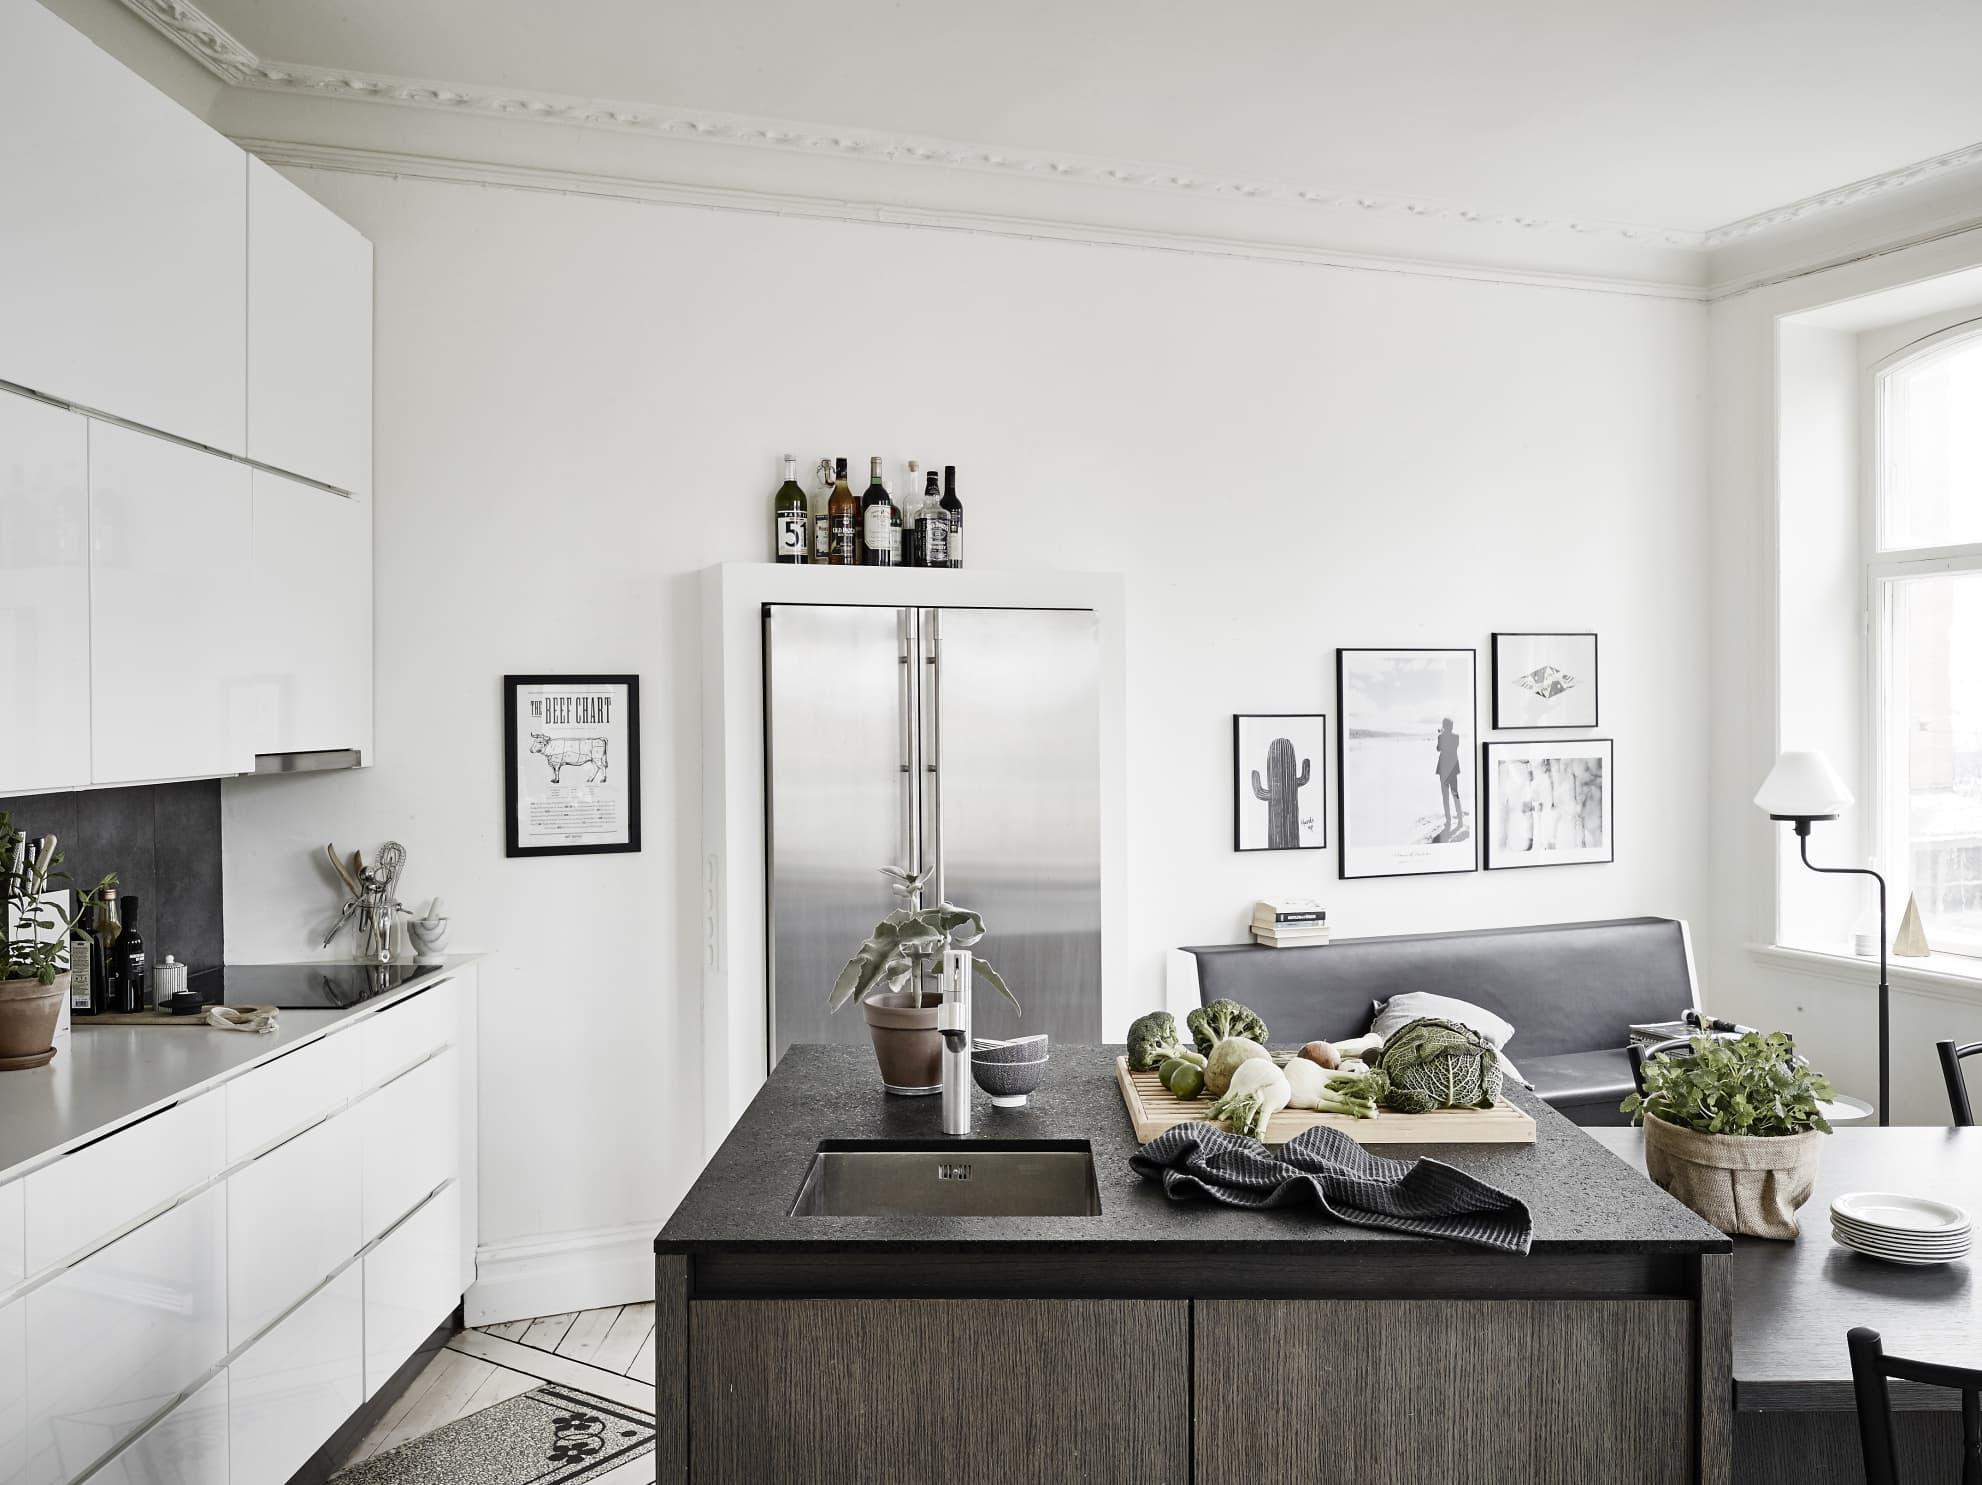 Small Apartment With A Big Kitchen Island Coco Lapine Designcoco Lapine Design